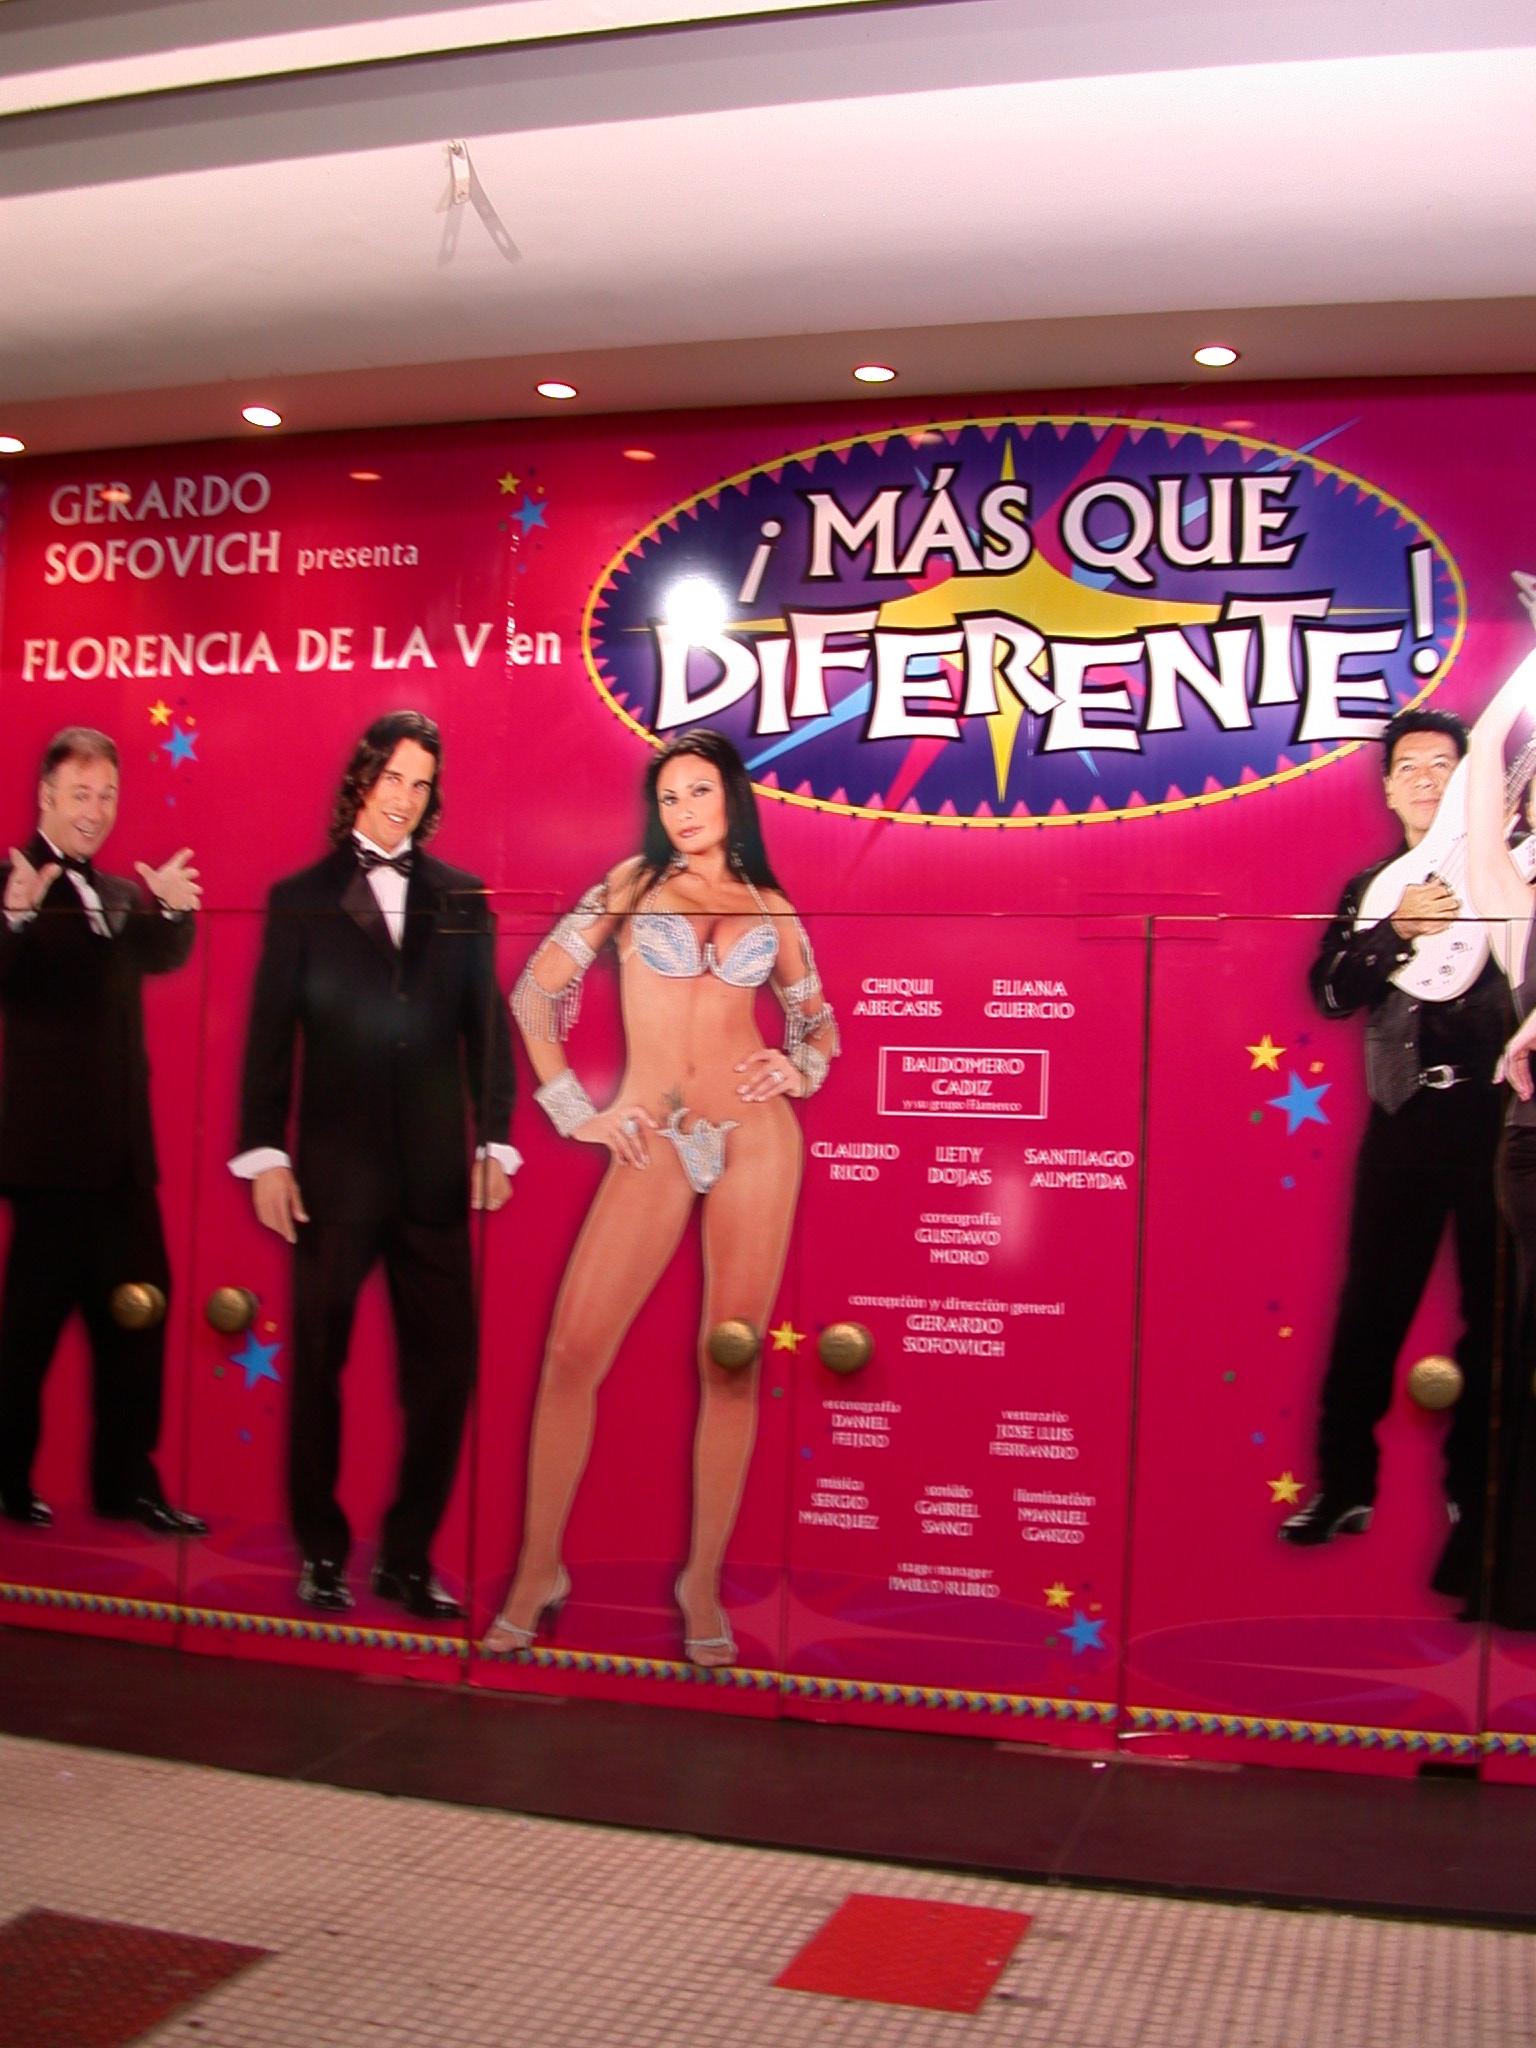 Burlesque Theater Entrance, Buenos Aires, Argentina